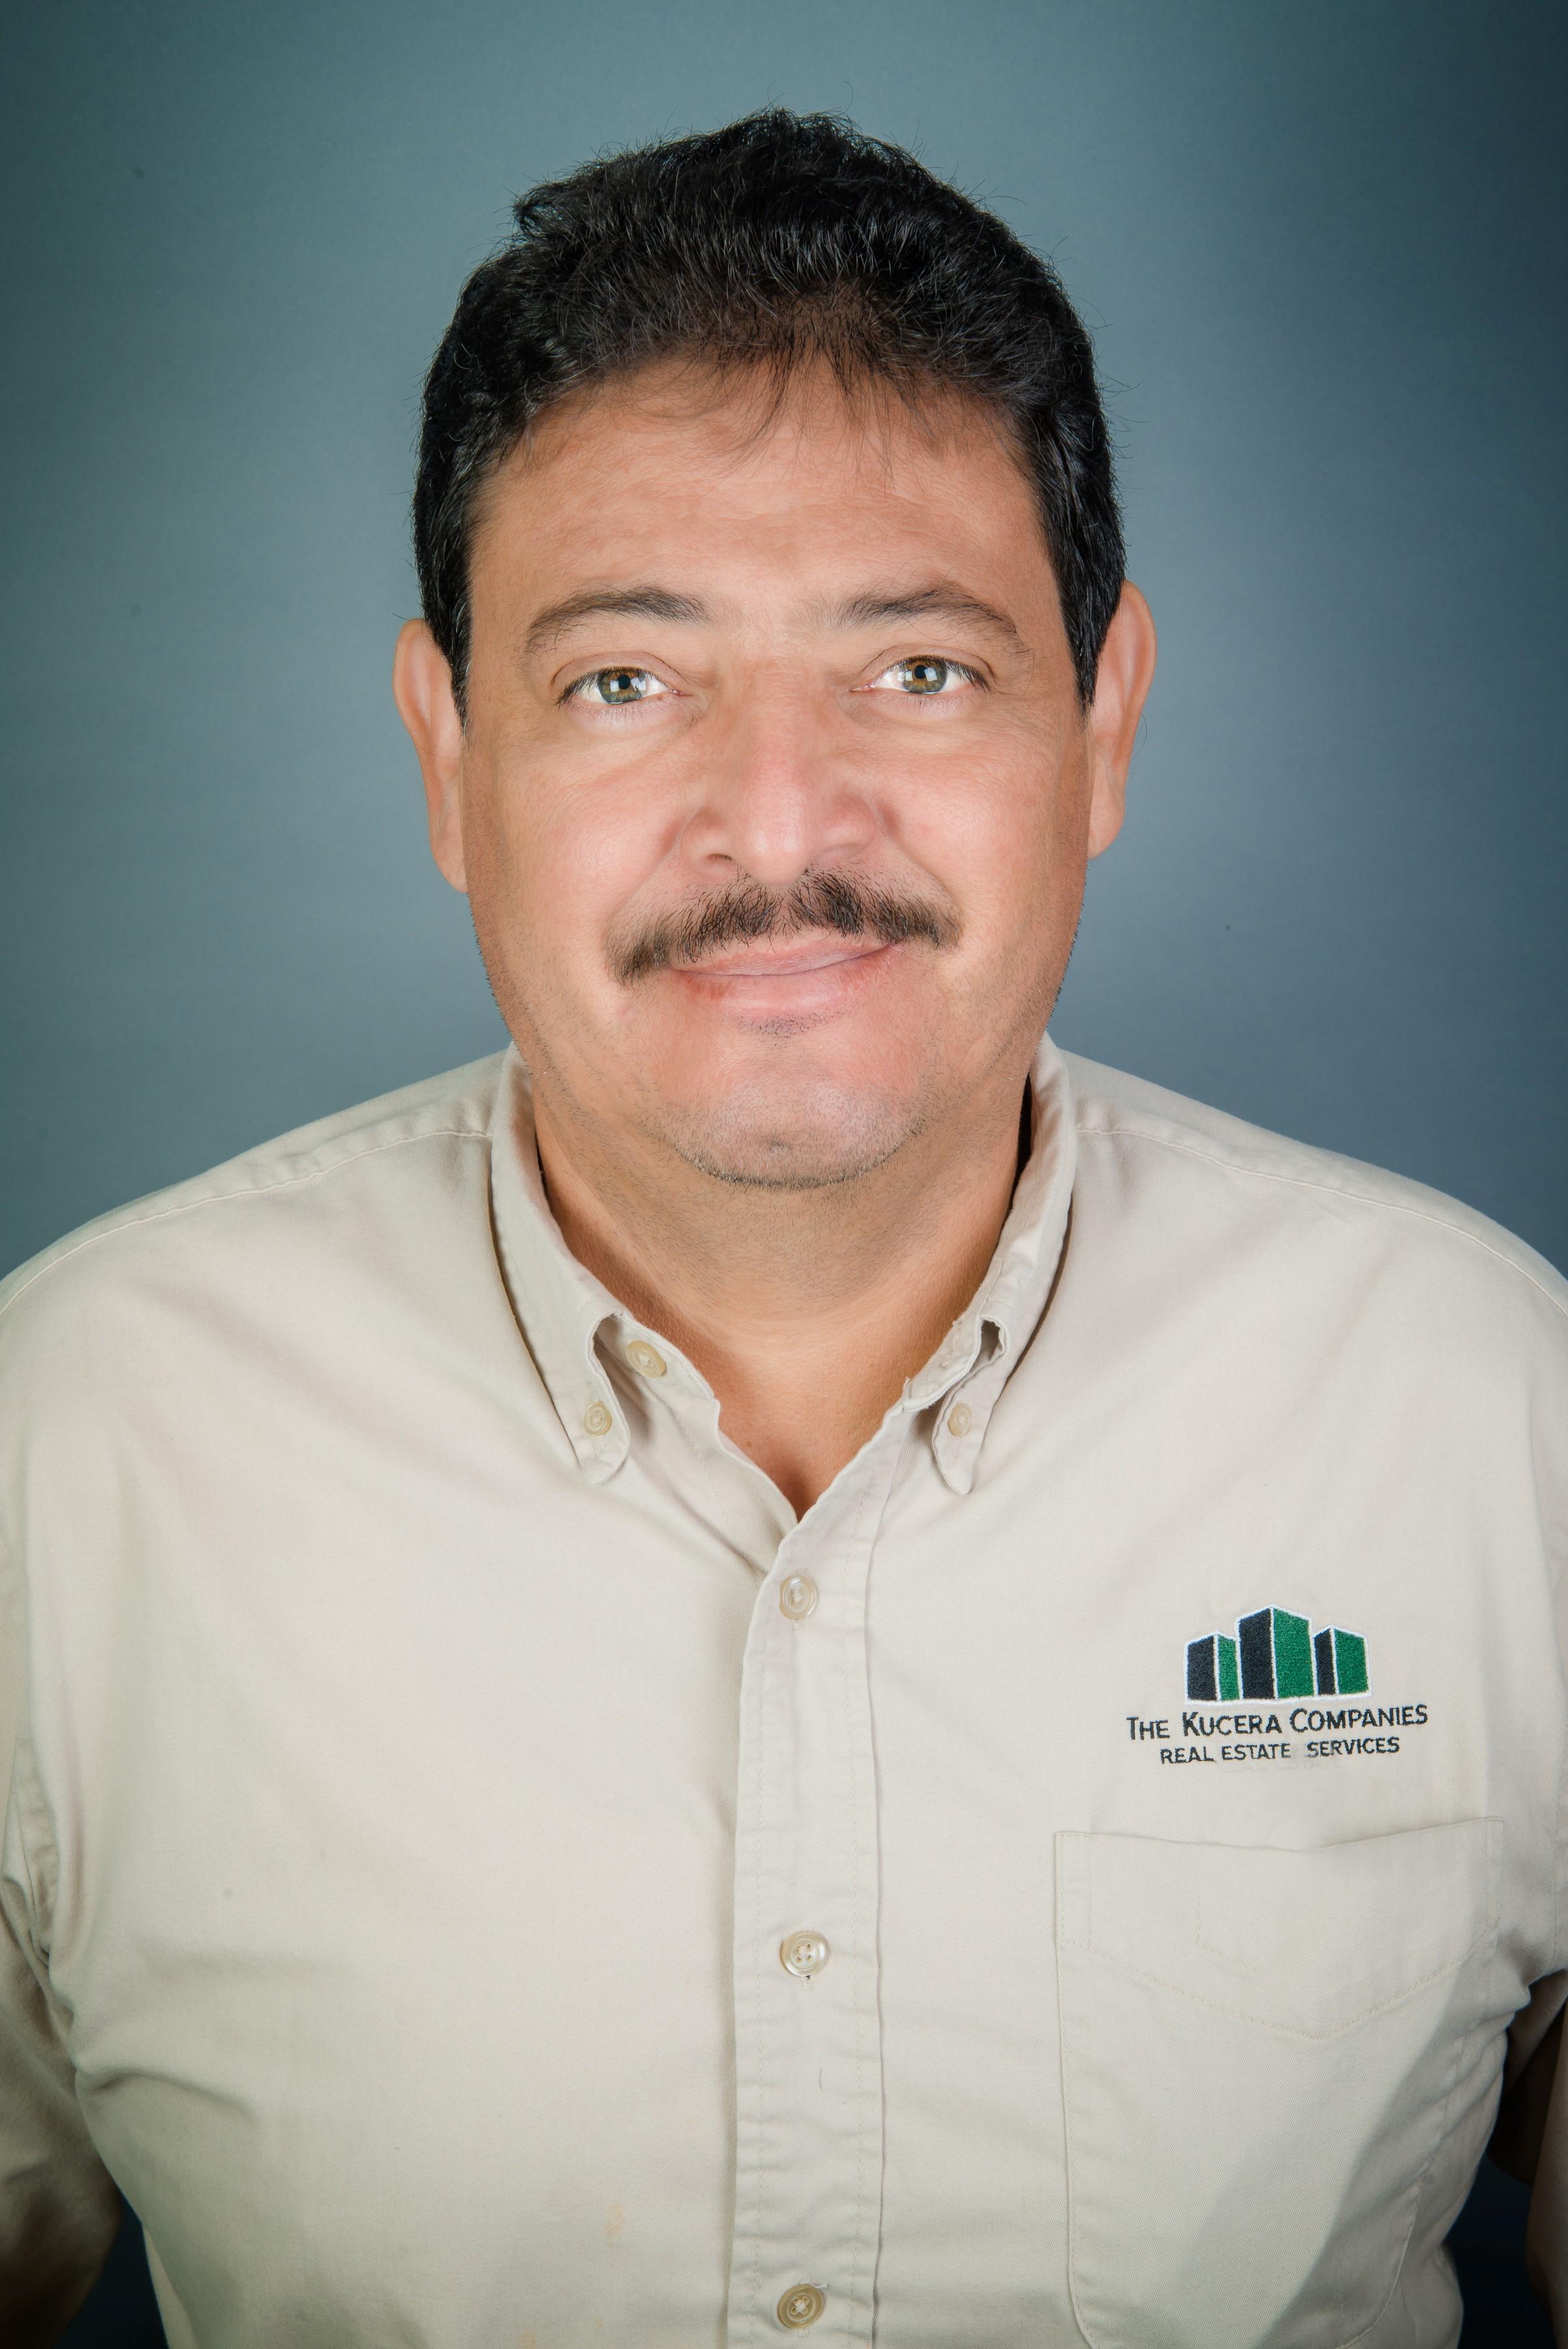 Noe Vasquez